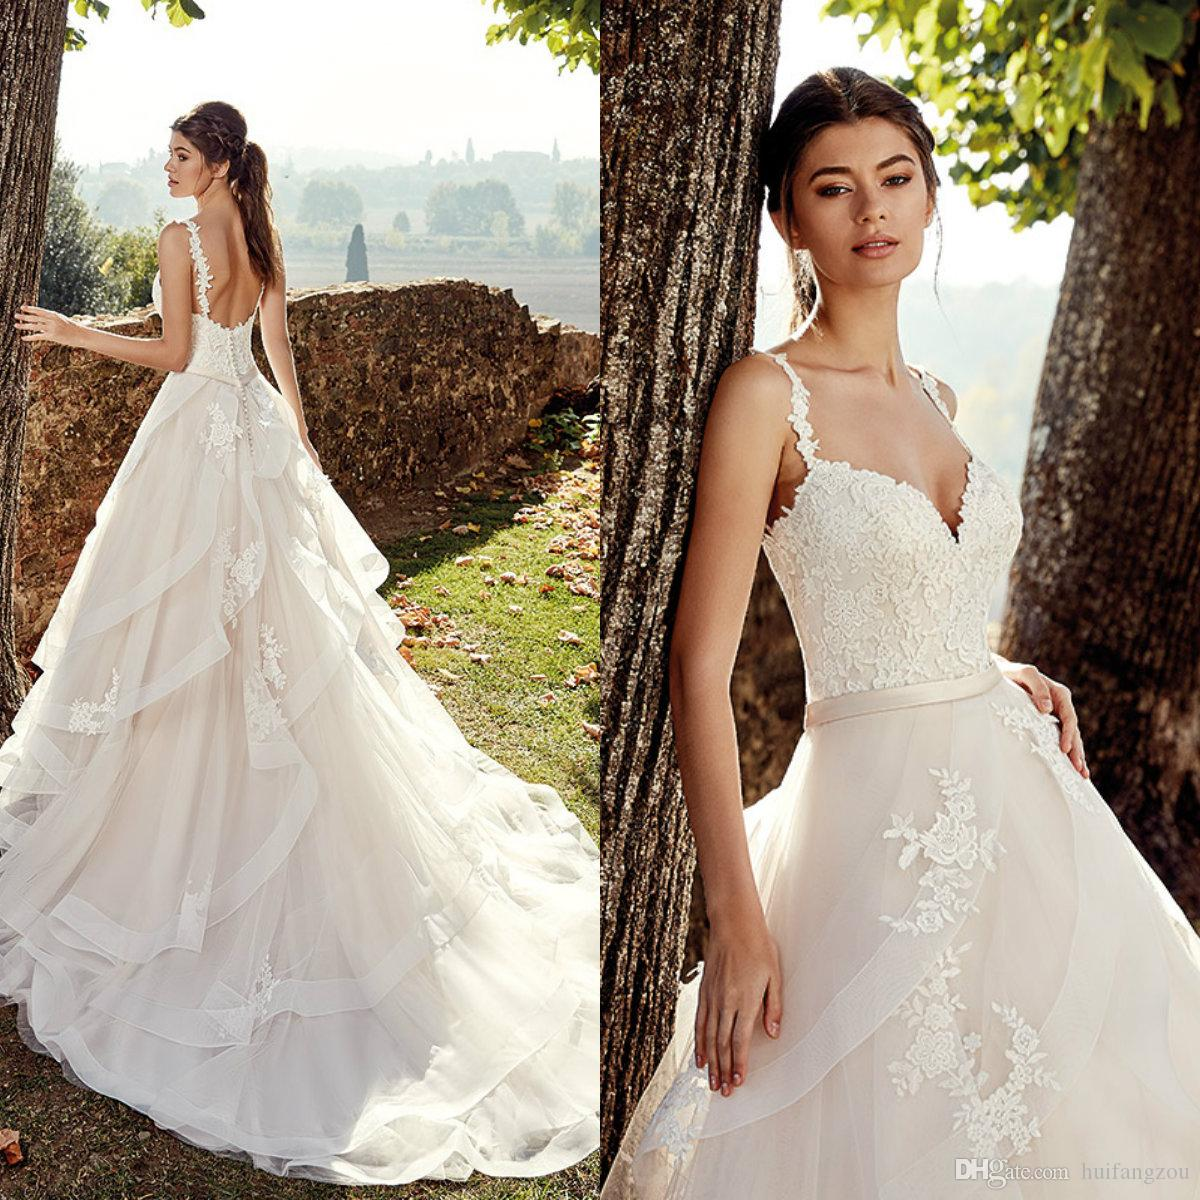 43d26a815629 Discount 2019 Vestido De Novia Vintage Wedding Dresses Backless Lace  Applique Tiered Skirts Bridal Gowns Sweep Train Summer Boho Wedding Dress  Fashion ...